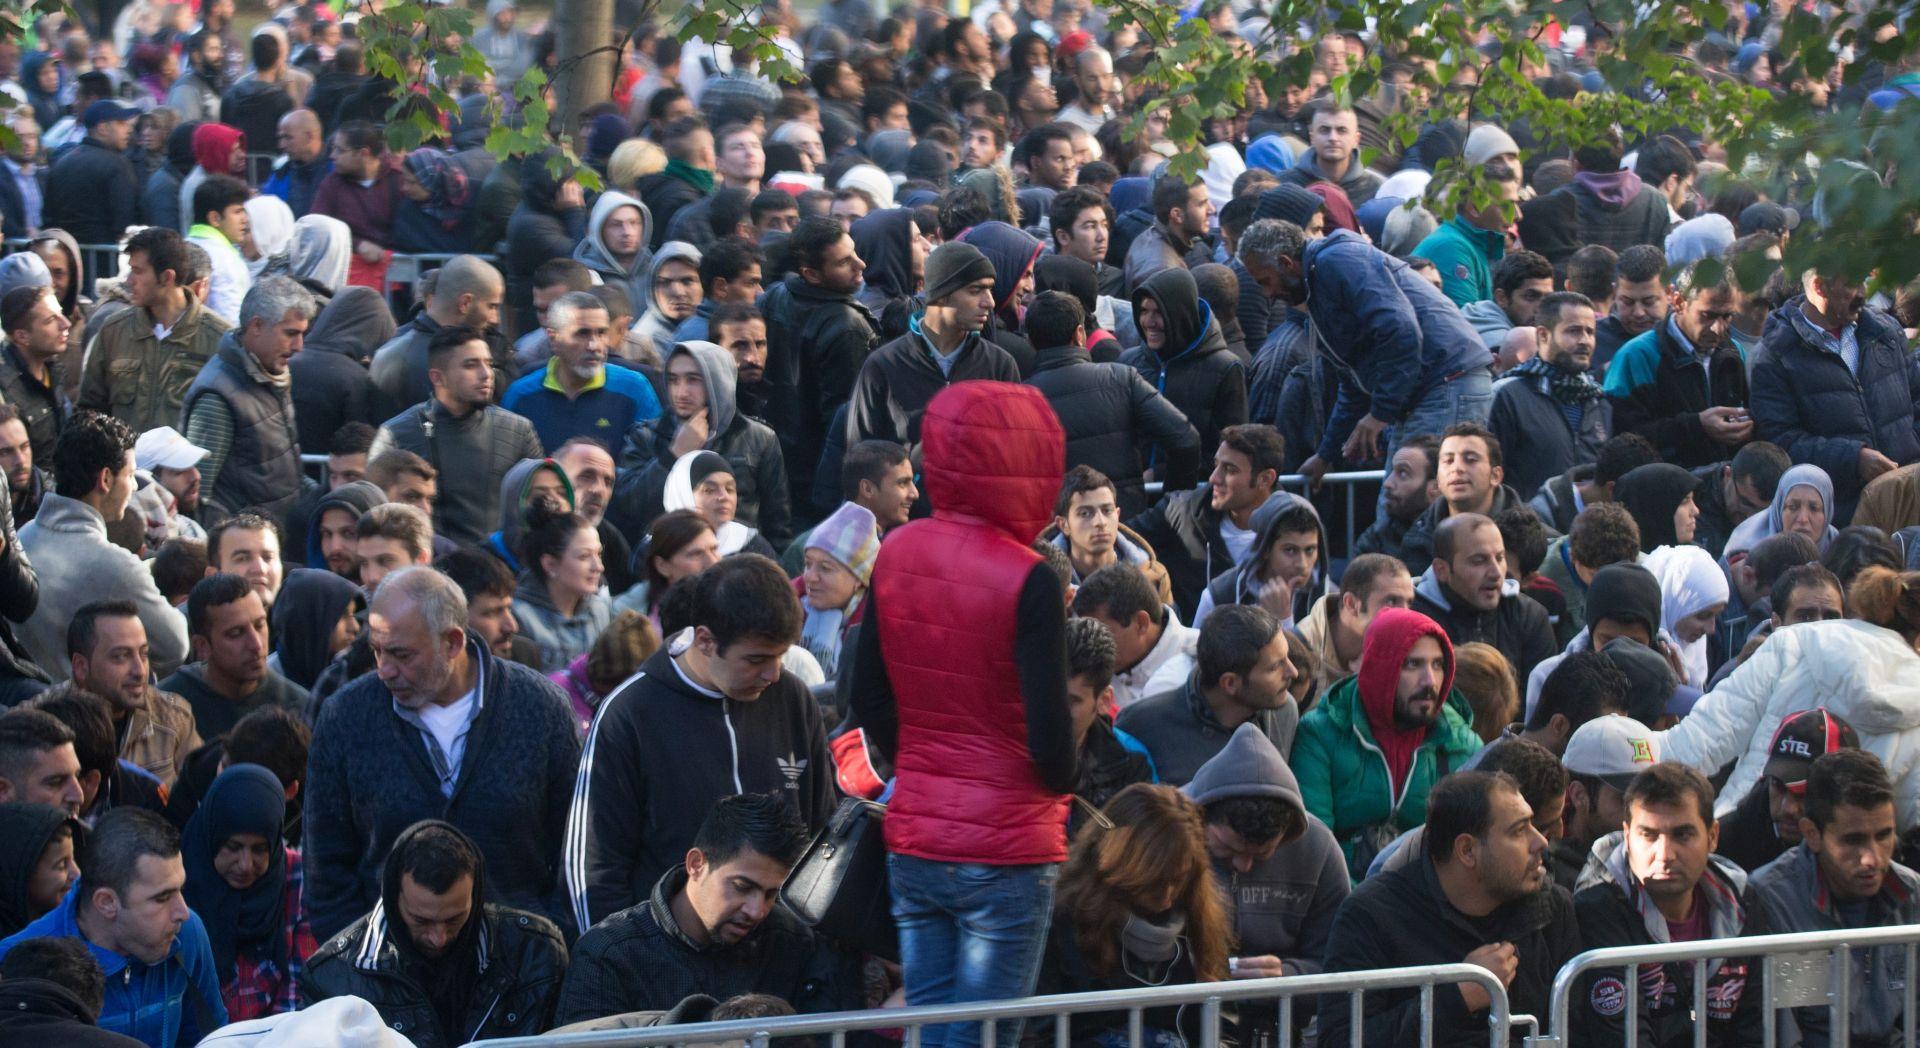 IZBJEGLICE Od početka krize zdravstvena skrb za gotovo 7,5 tisuća migranata